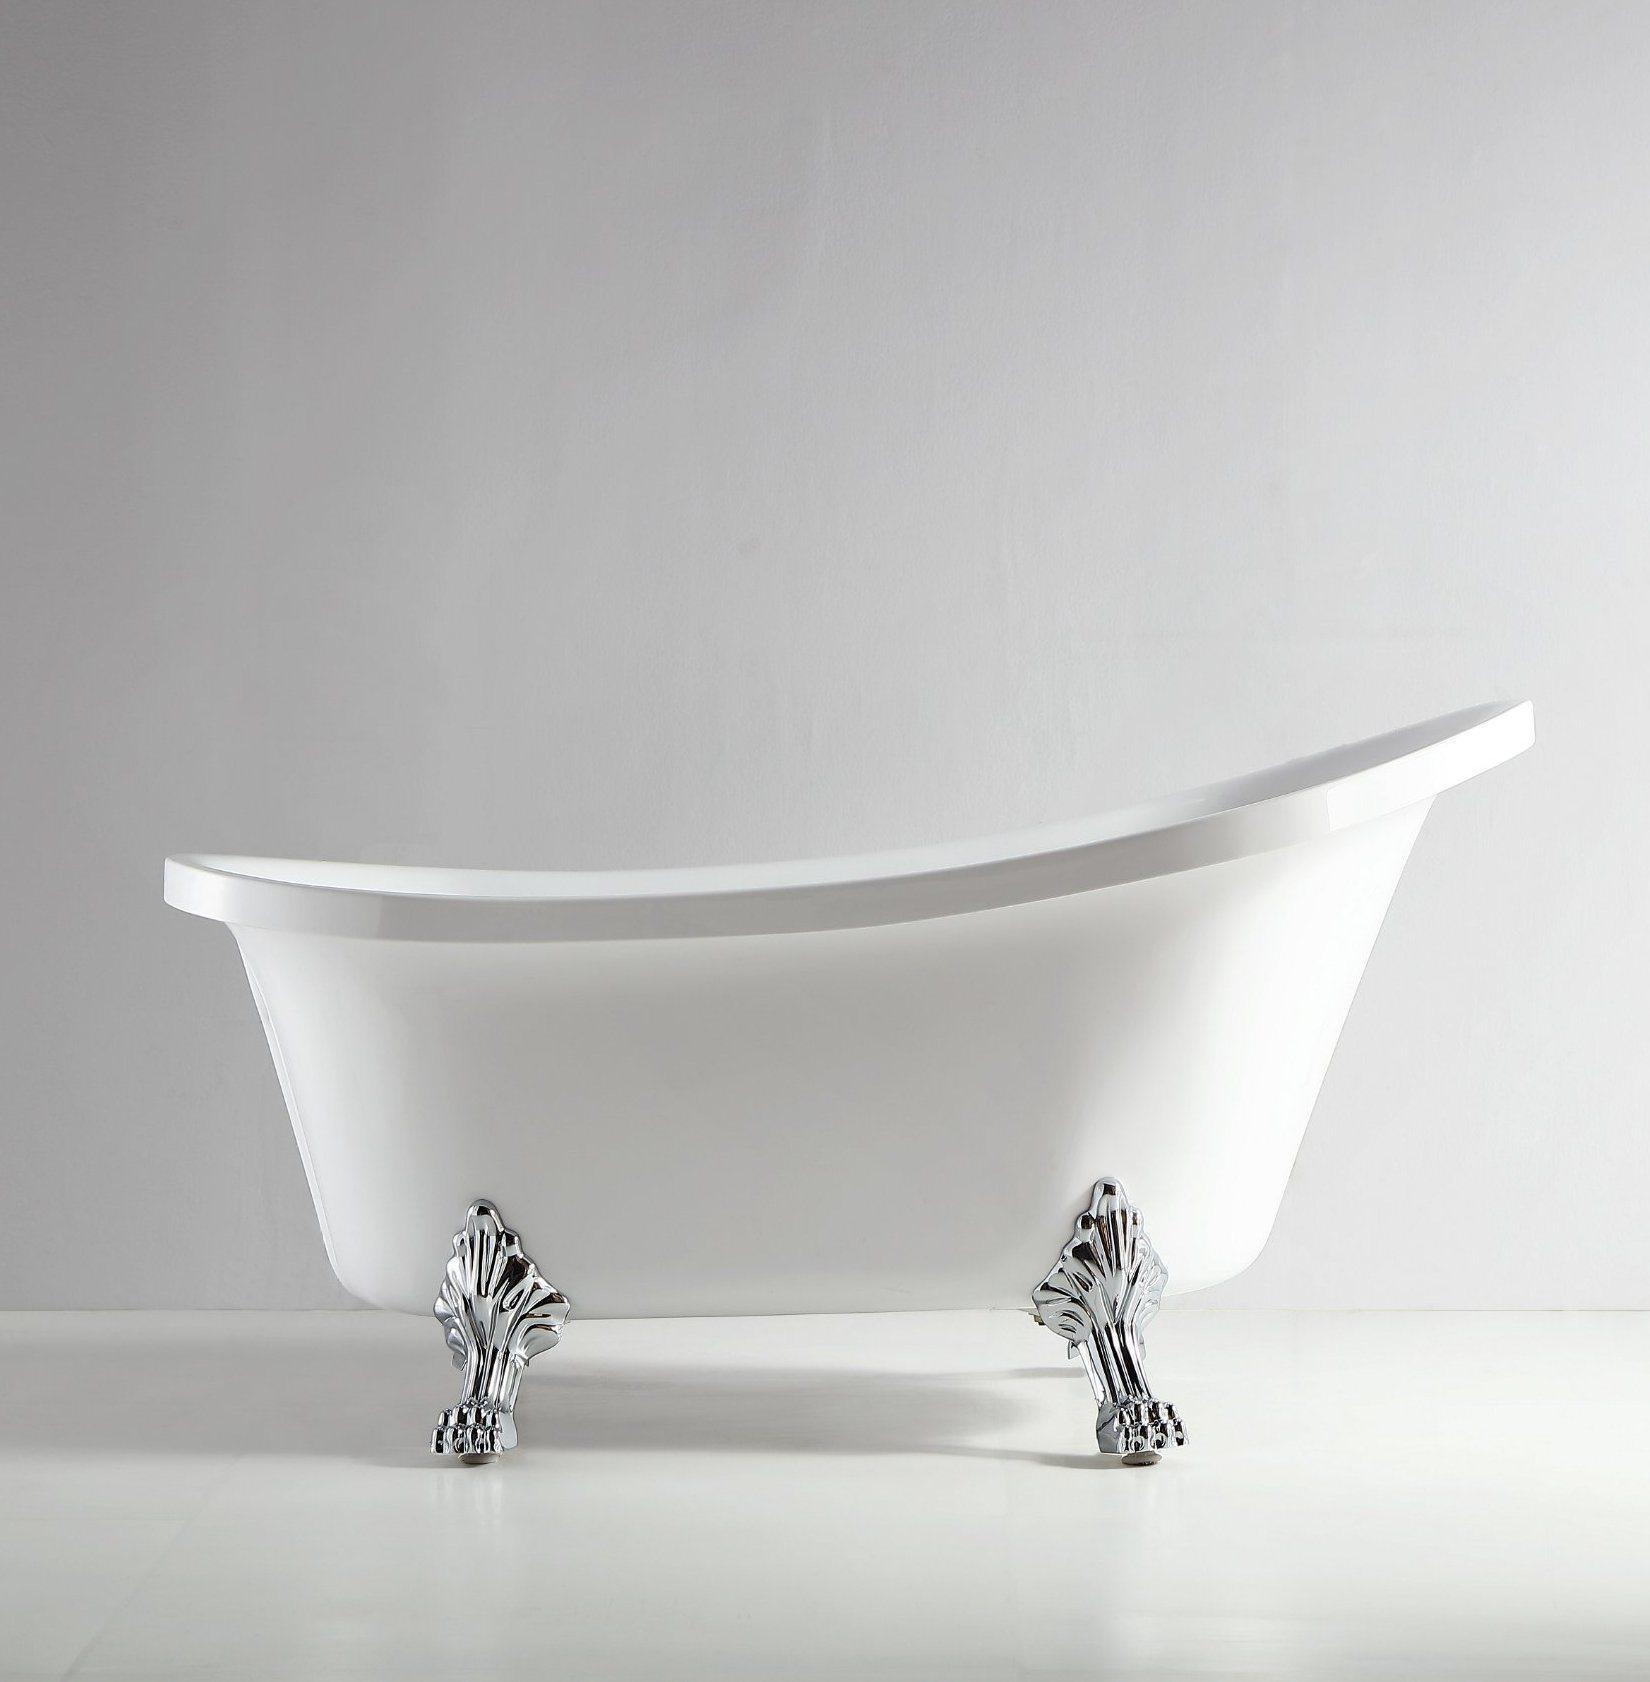 Hot Item Foshan Acrylic Claw Foot Freestanding Shower Tub 1 5m Q371s 150